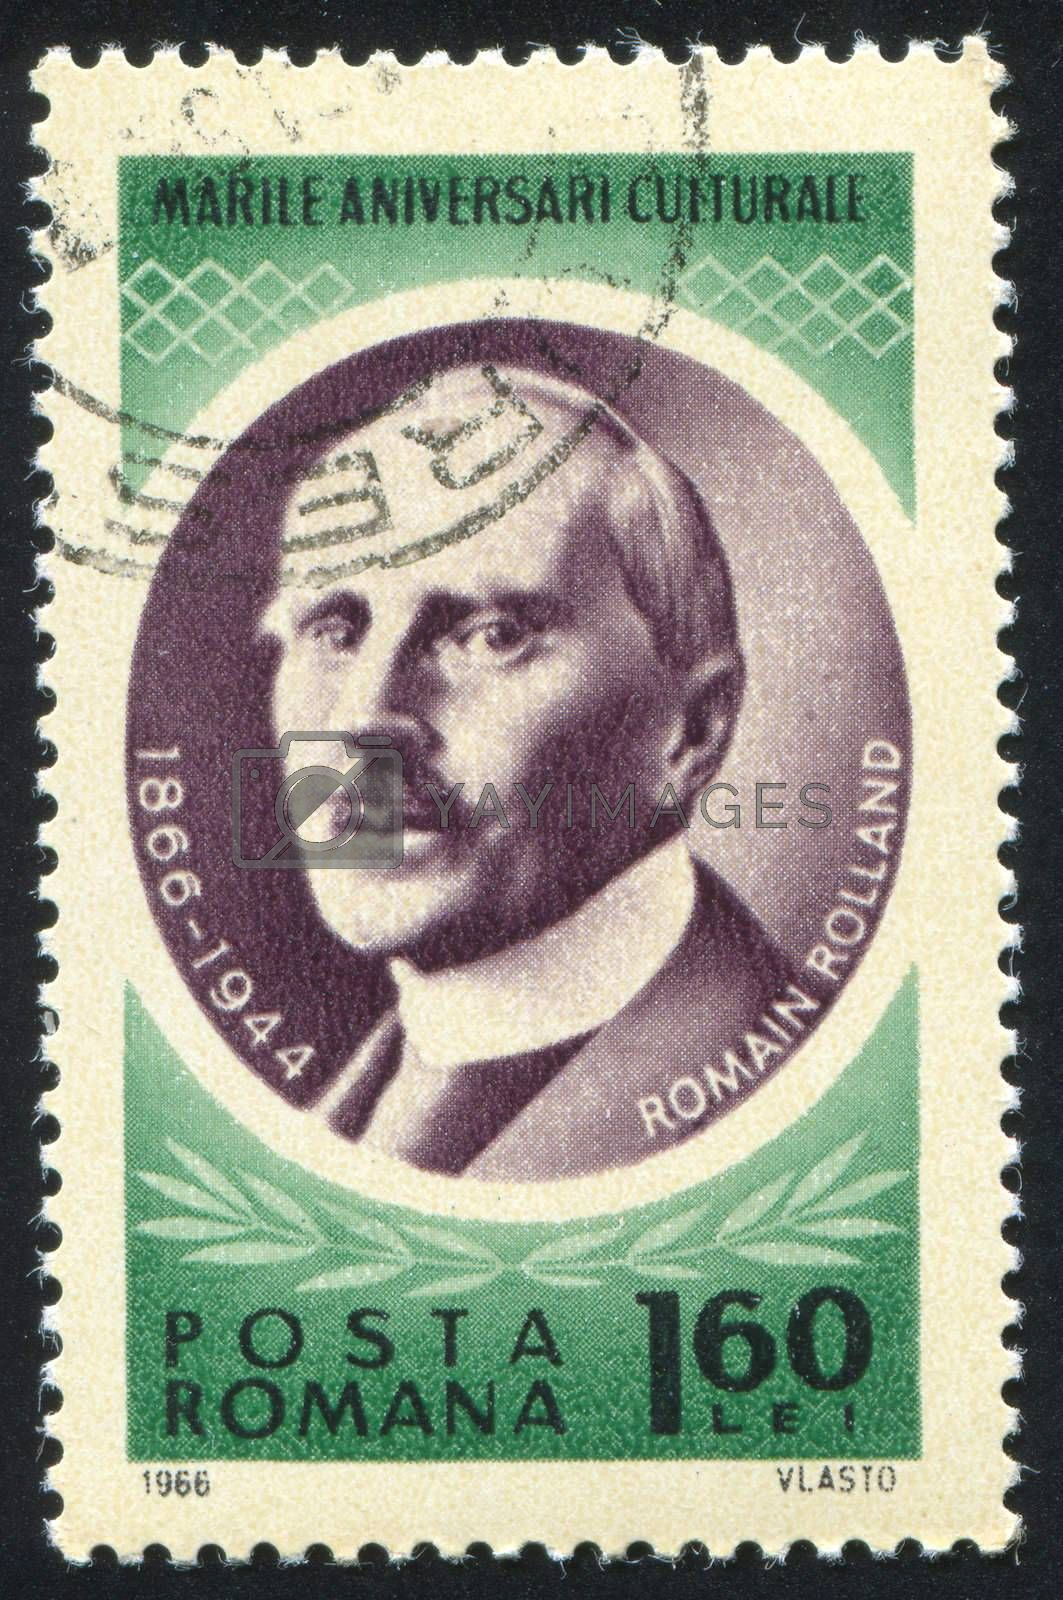 ROMANIA - CIRCA 1966: stamp printed by Romania, show Romain Rolland, circa 1966.